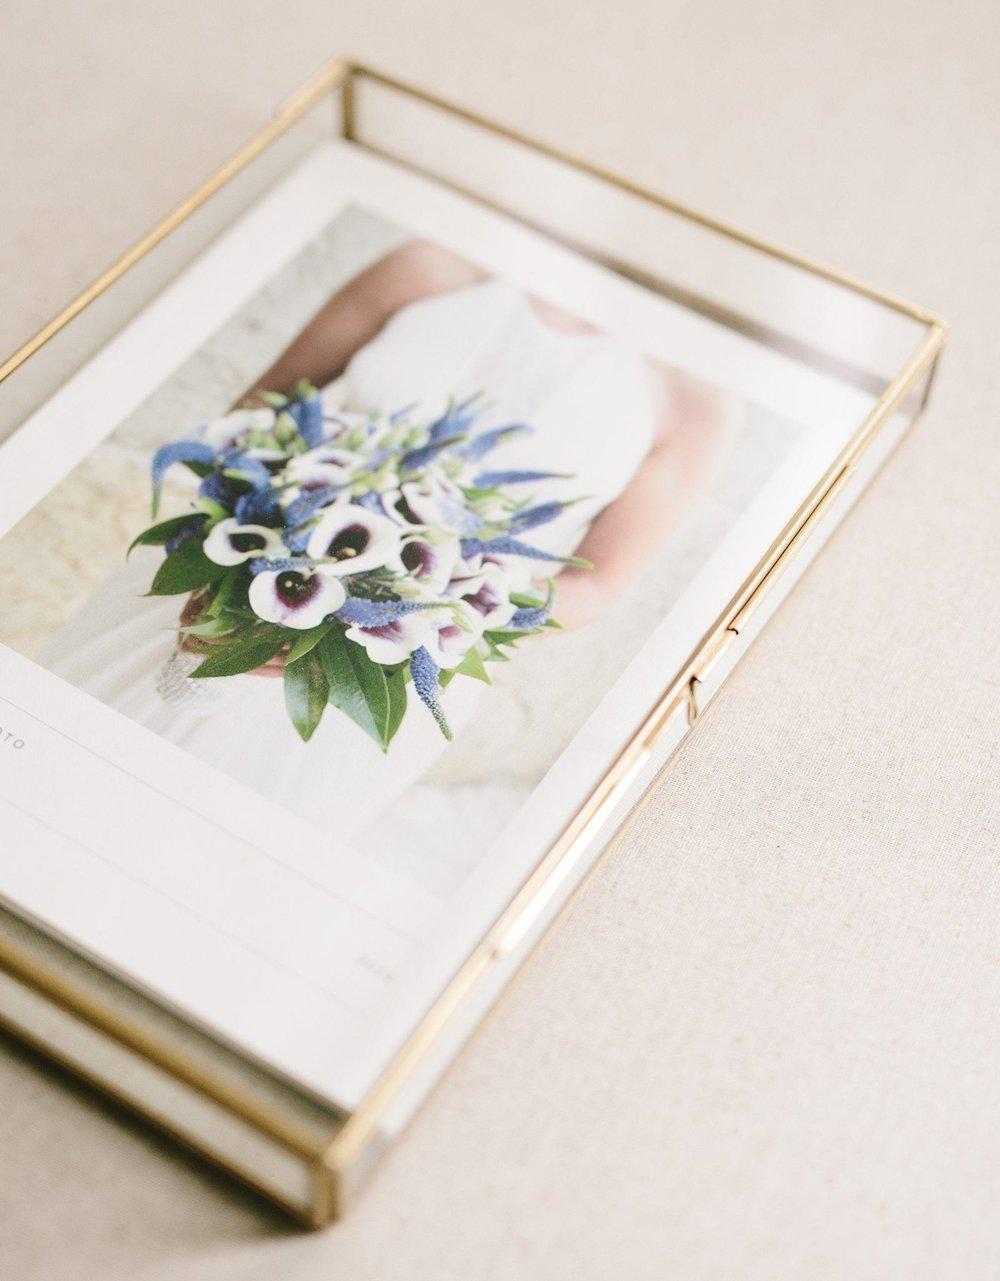 glass luxe heirloom folio box wilmington NC photographer